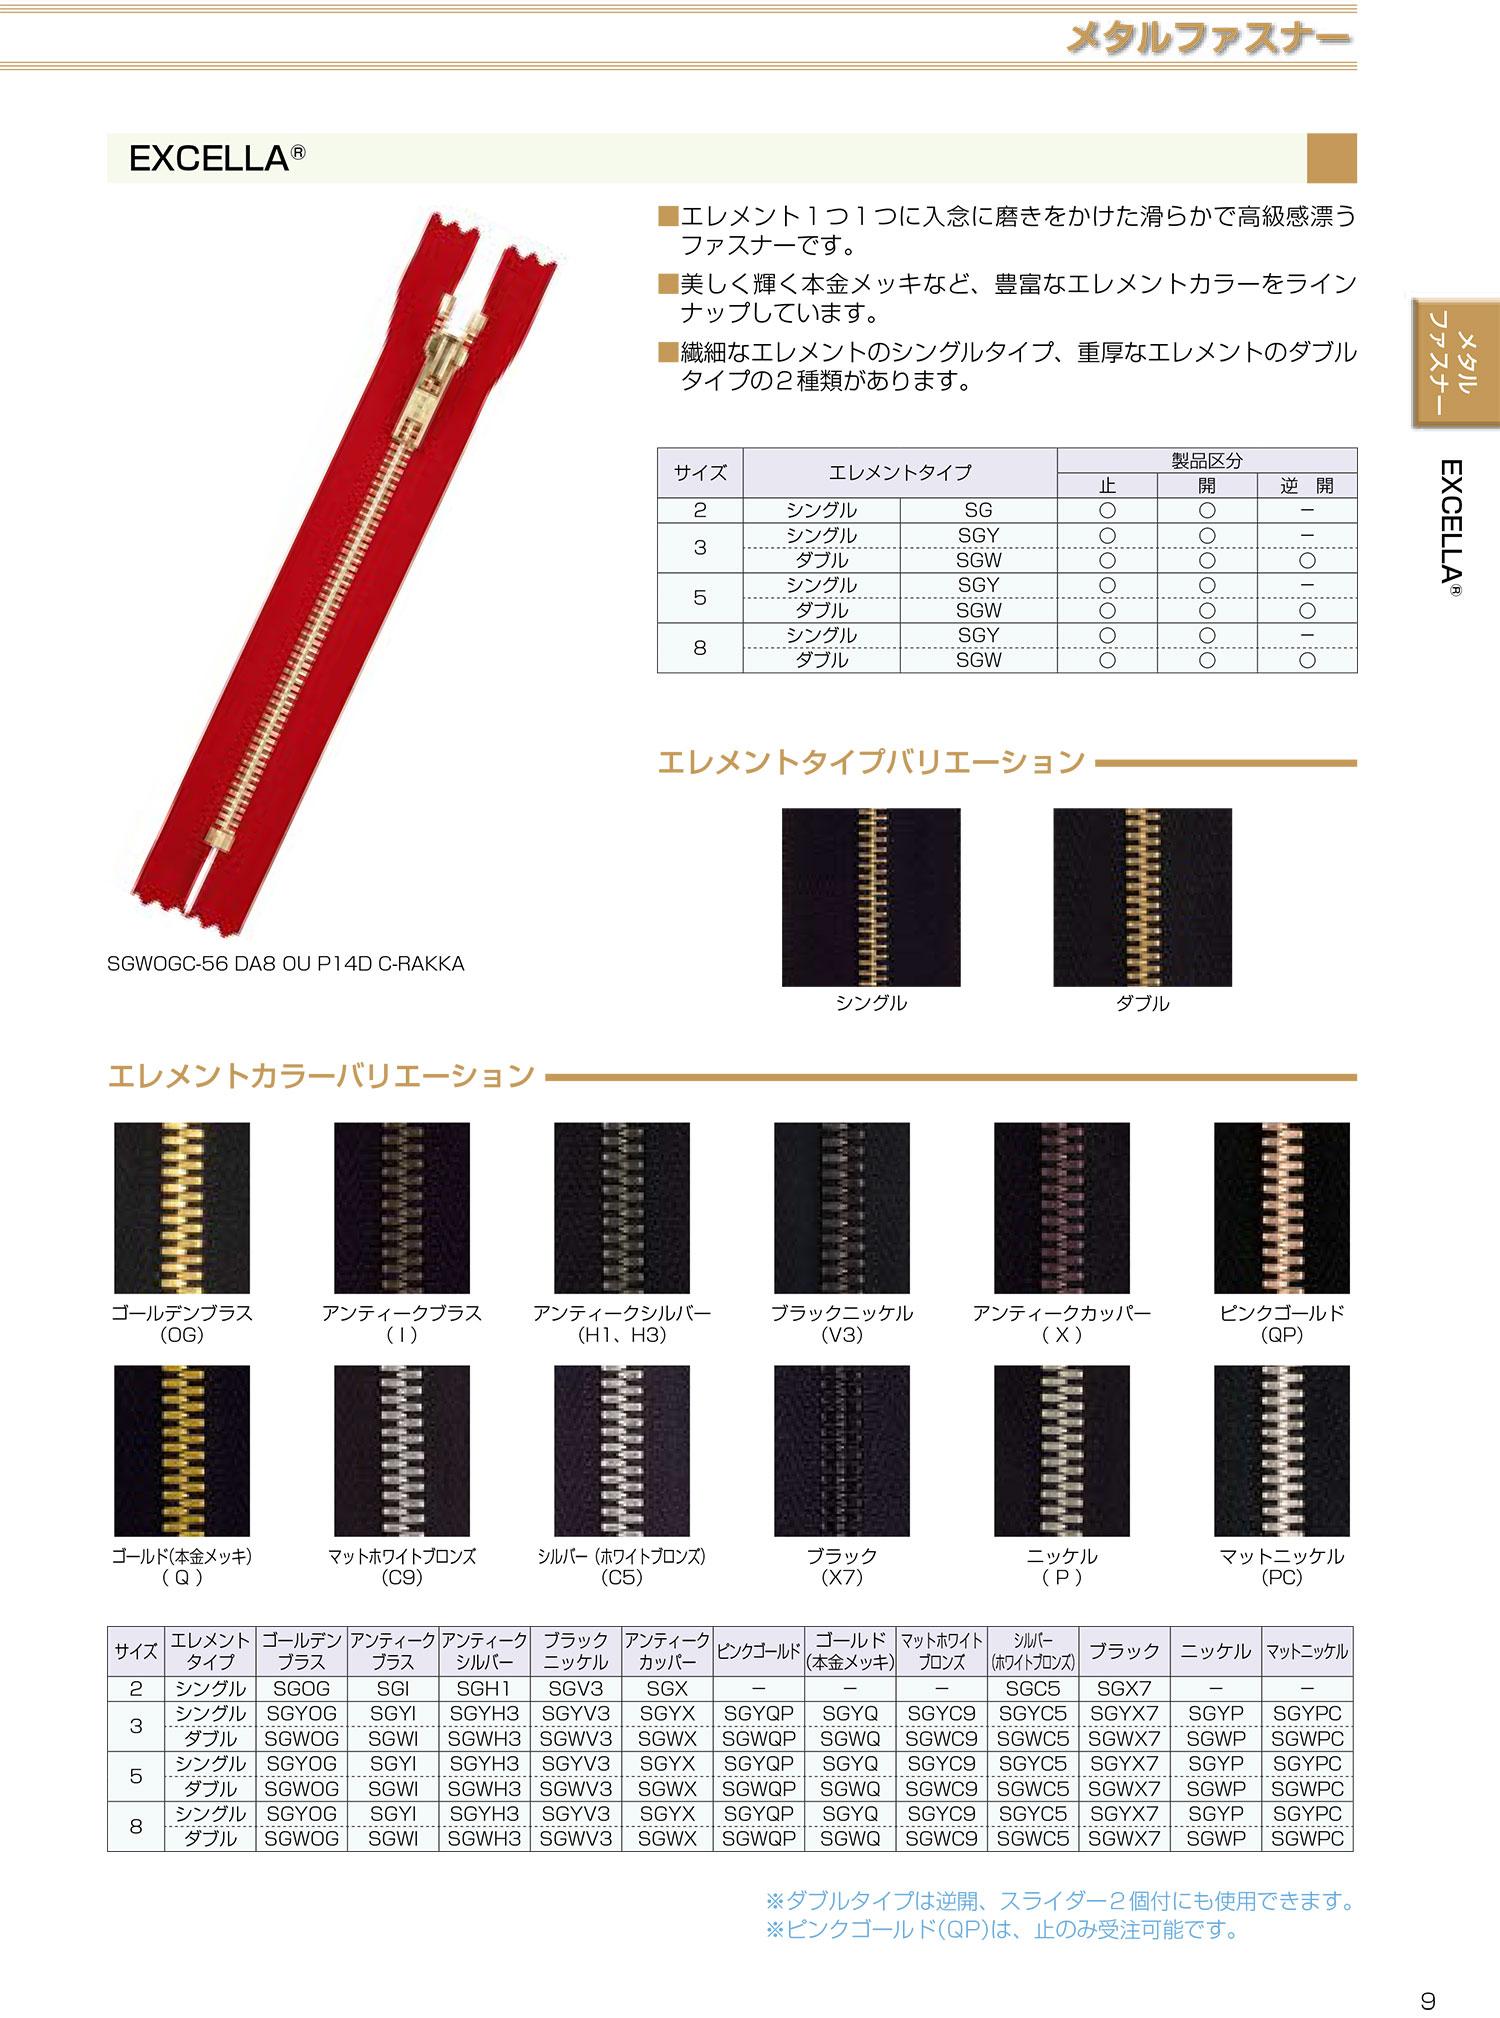 8SGWOGMR エクセラ 8サイズ ゴールデンブラス 逆開 ダブル[ファスナー] YKK/オークラ商事 - ApparelX アパレル資材卸通販